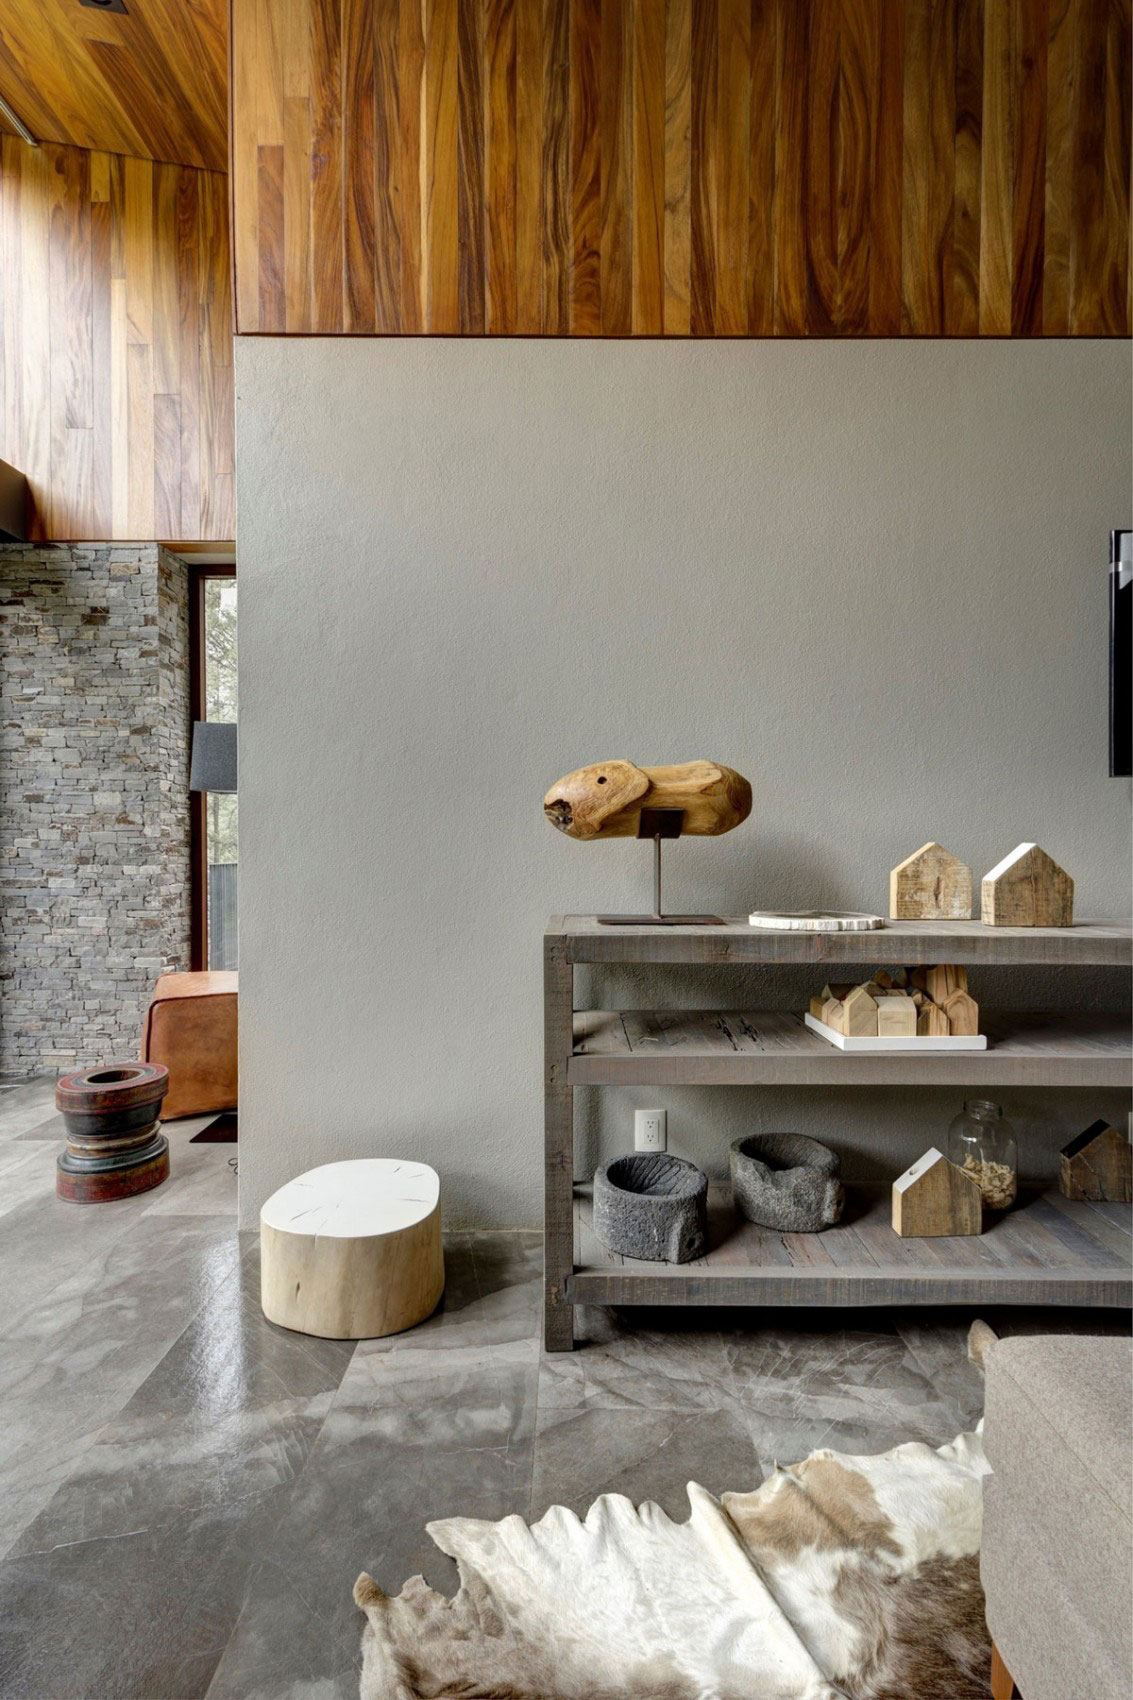 Beautiful Casa-MM-with-a-contemporary-design-created by-Elias-Rizo-Arquitectos-12 Beautiful Casa-MM with a contemporary design created by Elias Rizo Arquitectos